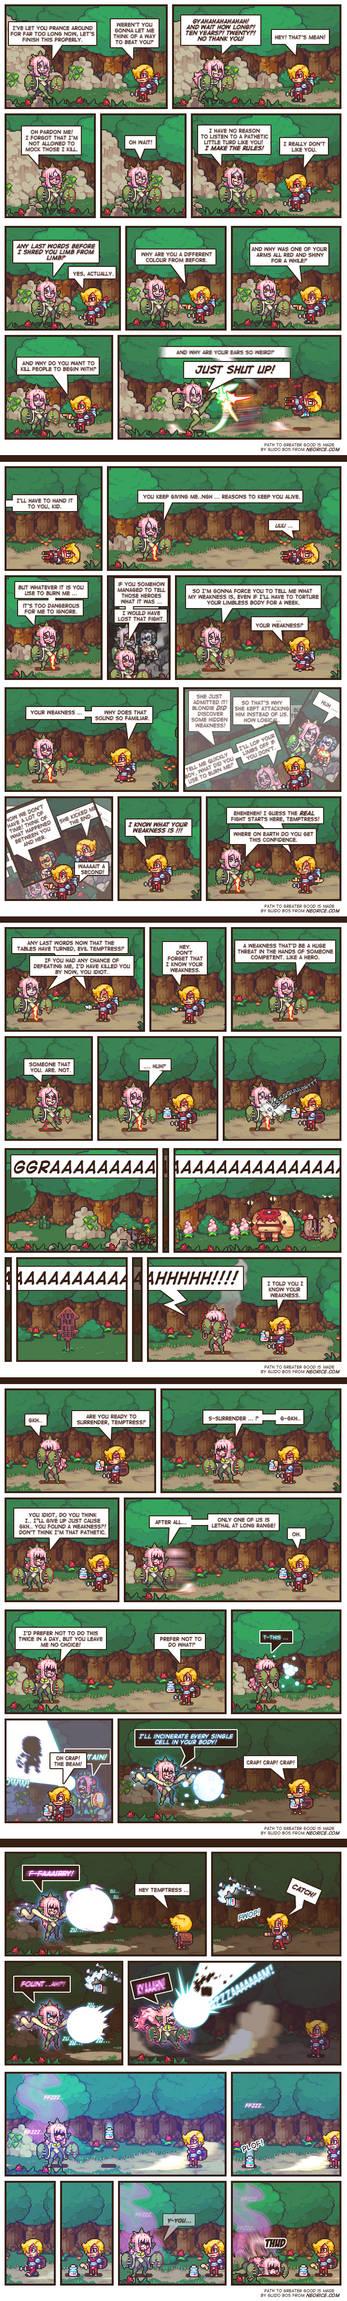 TOM RPG page 91-100